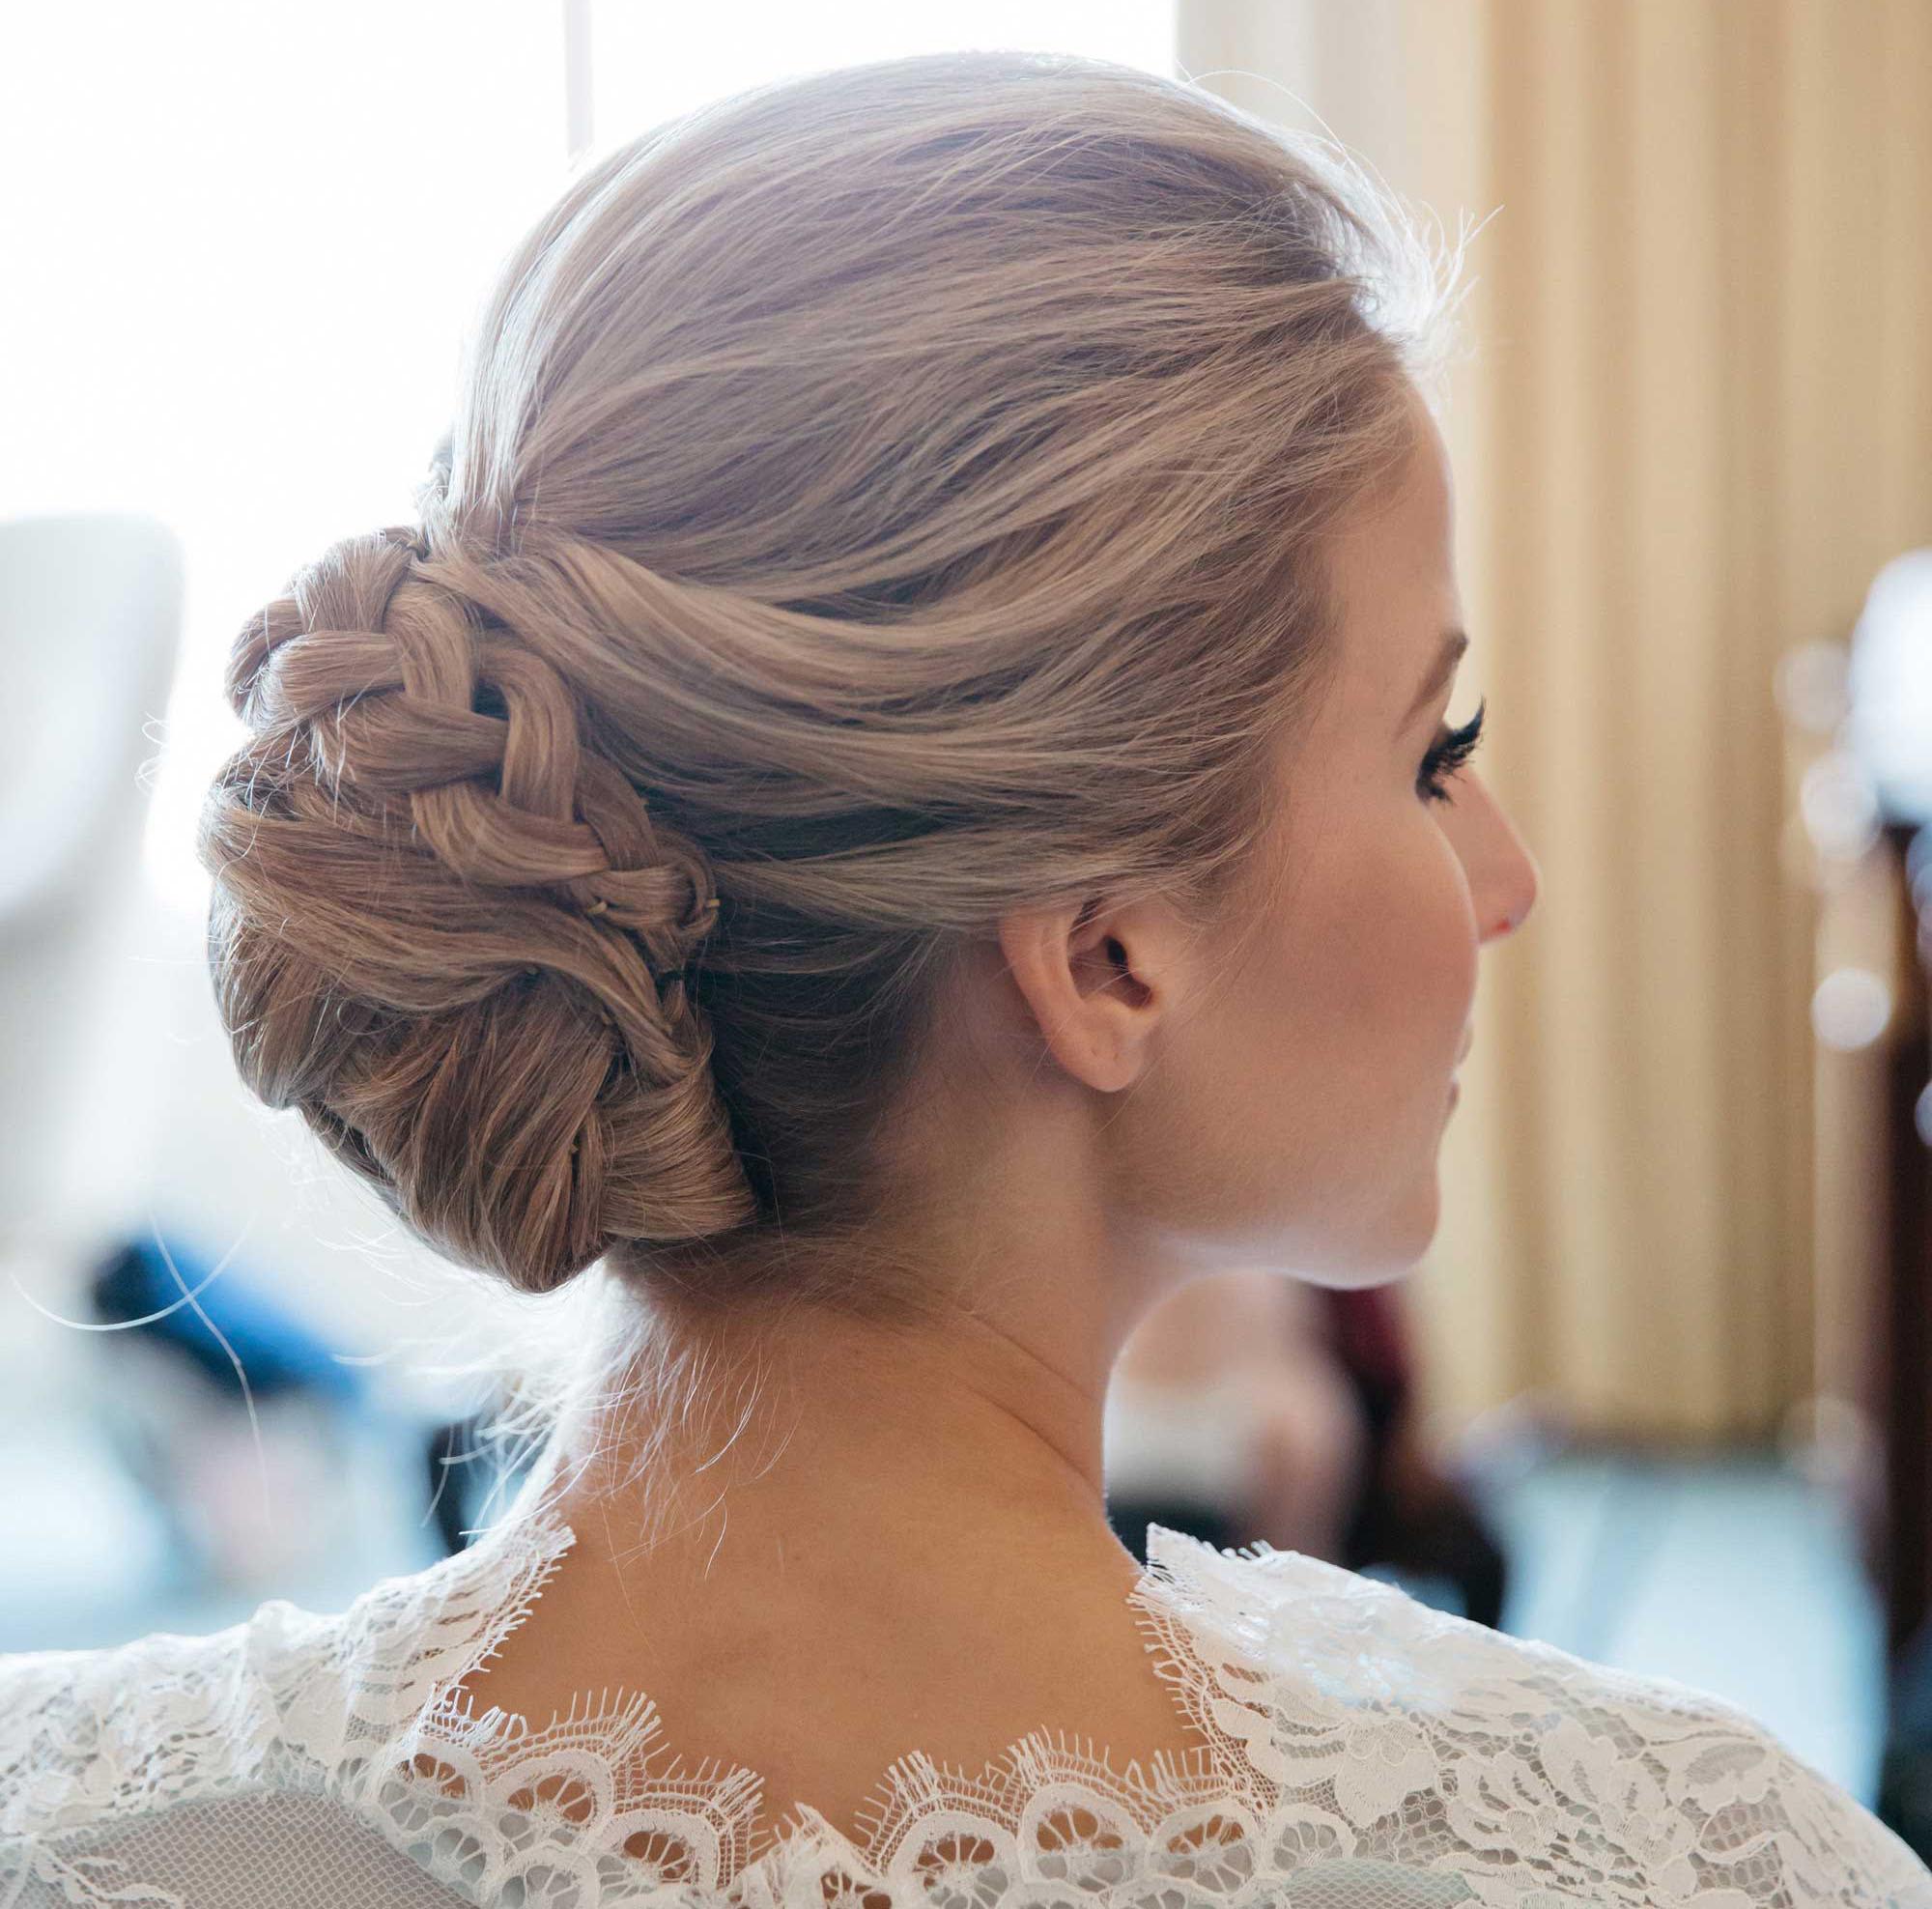 Wondrous Braided Hairstyles 5 Ideas For Your Wedding Look Inside Weddings Short Hairstyles Gunalazisus